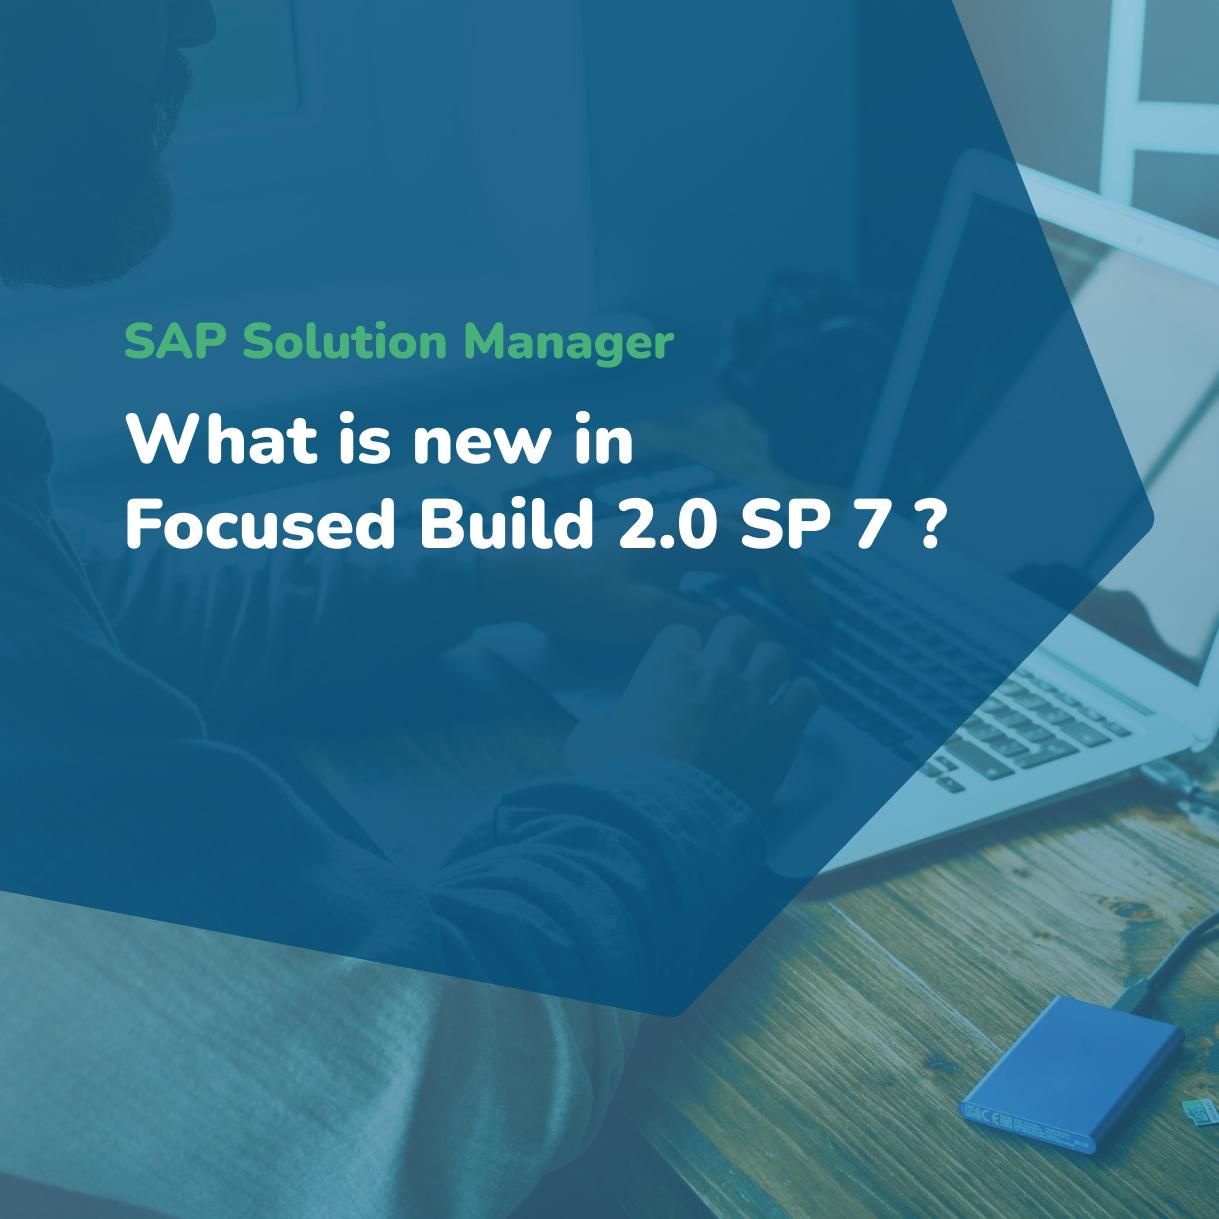 SAP Solution Manager - Focused Build